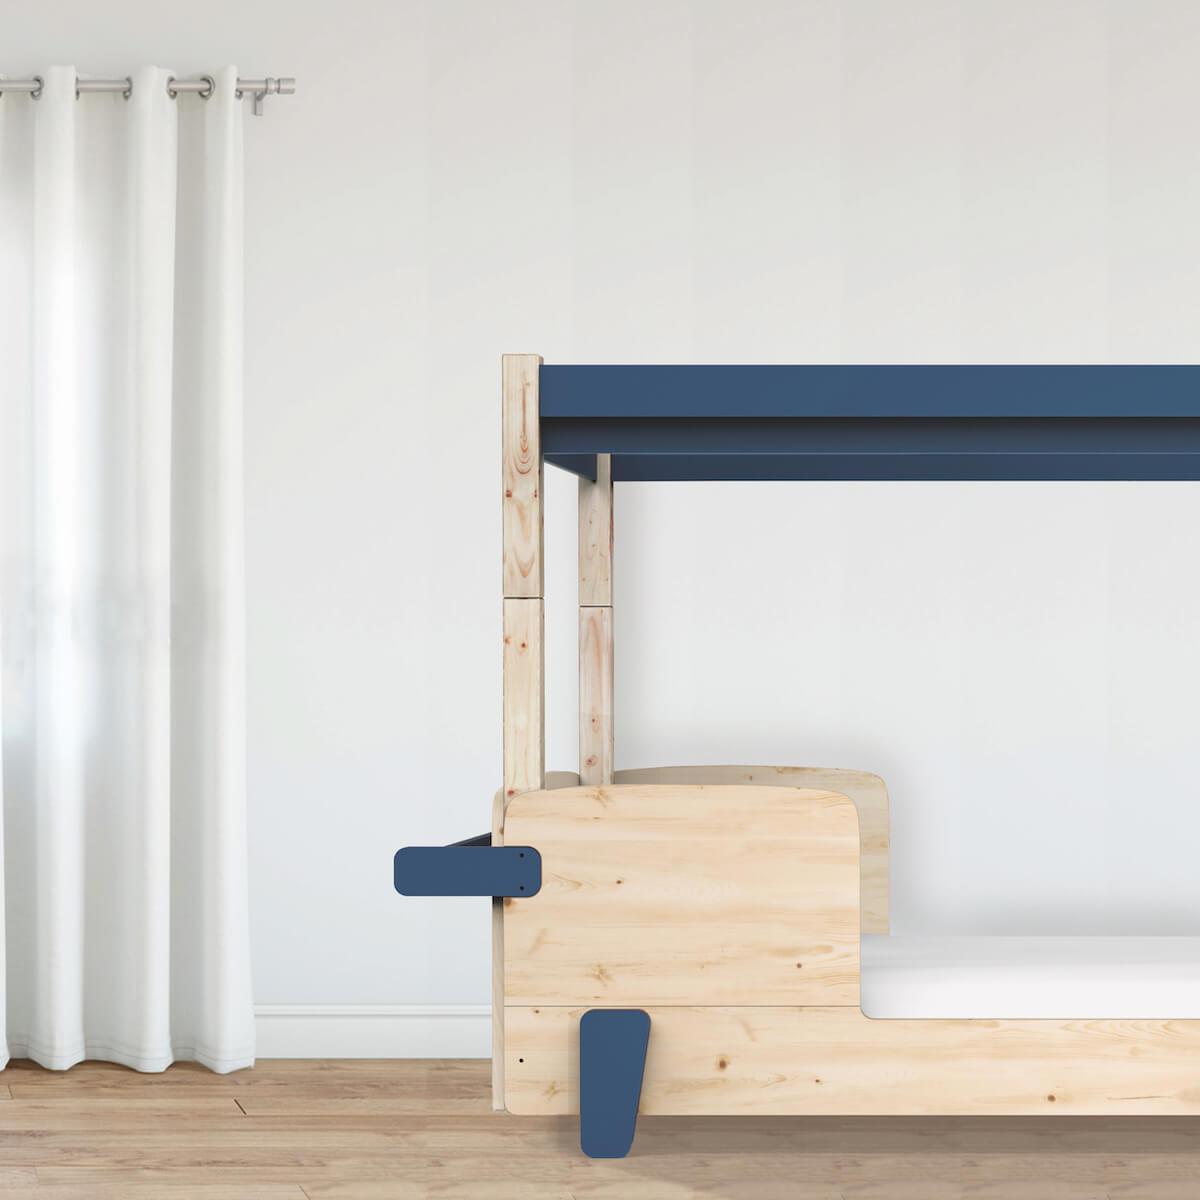 Lit baldaquin 90x190cm DISCOVERY Mathy by Bols bleu atlantic